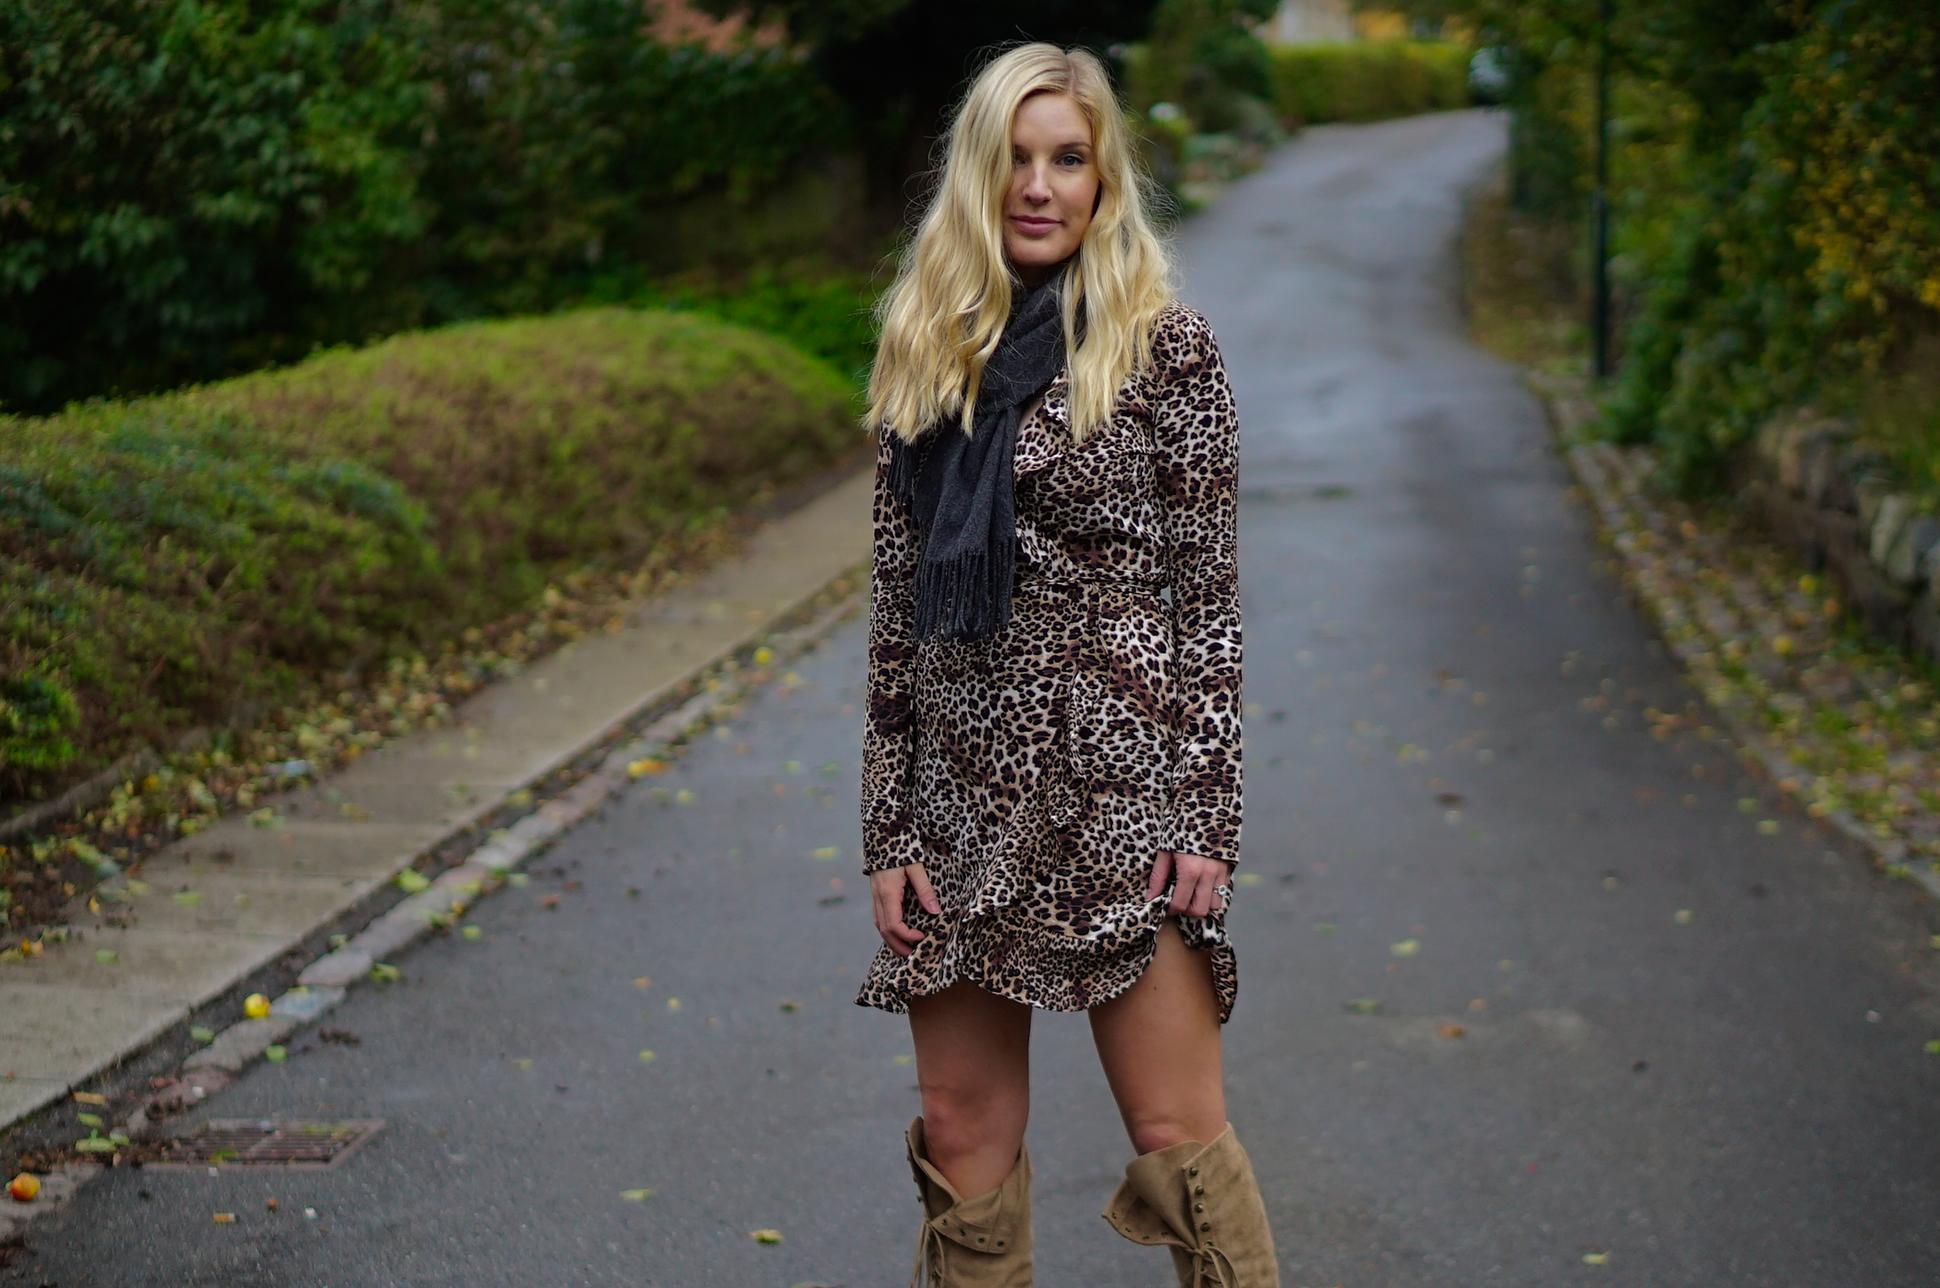 The Leopard Wrap Dress